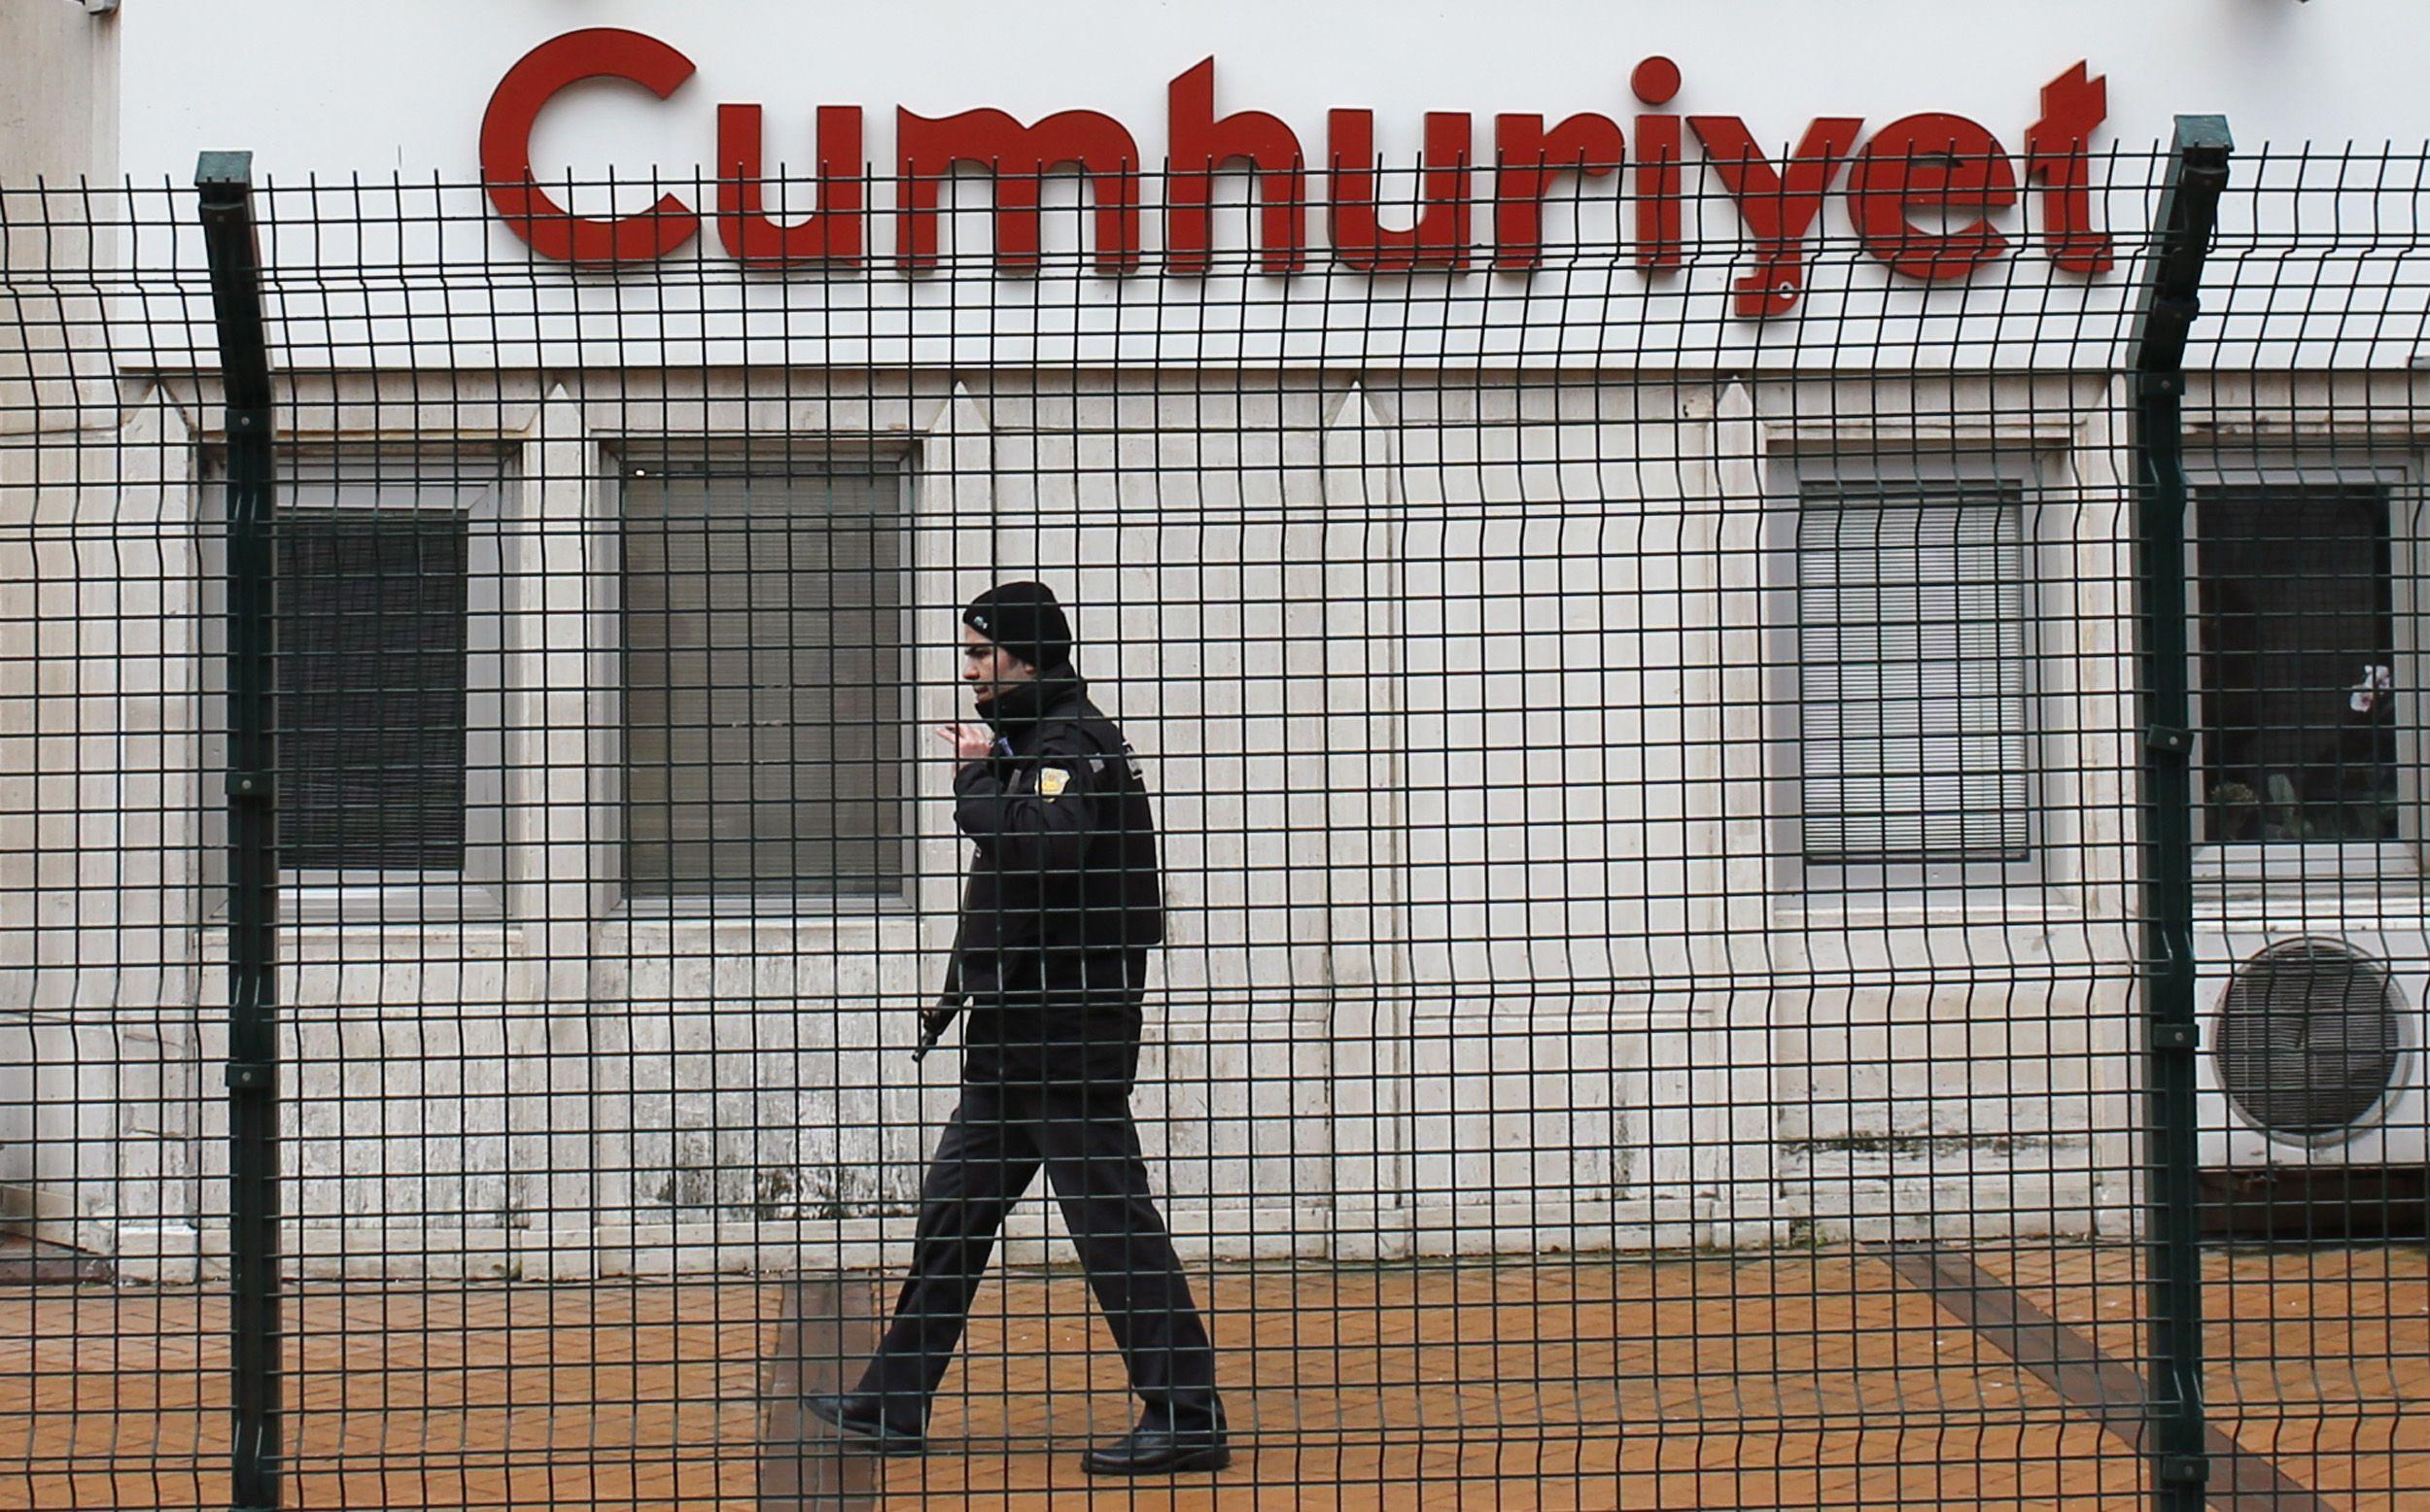 Turkey Investigating Newspaper for Publishing Charlie Hebdo Cartoon